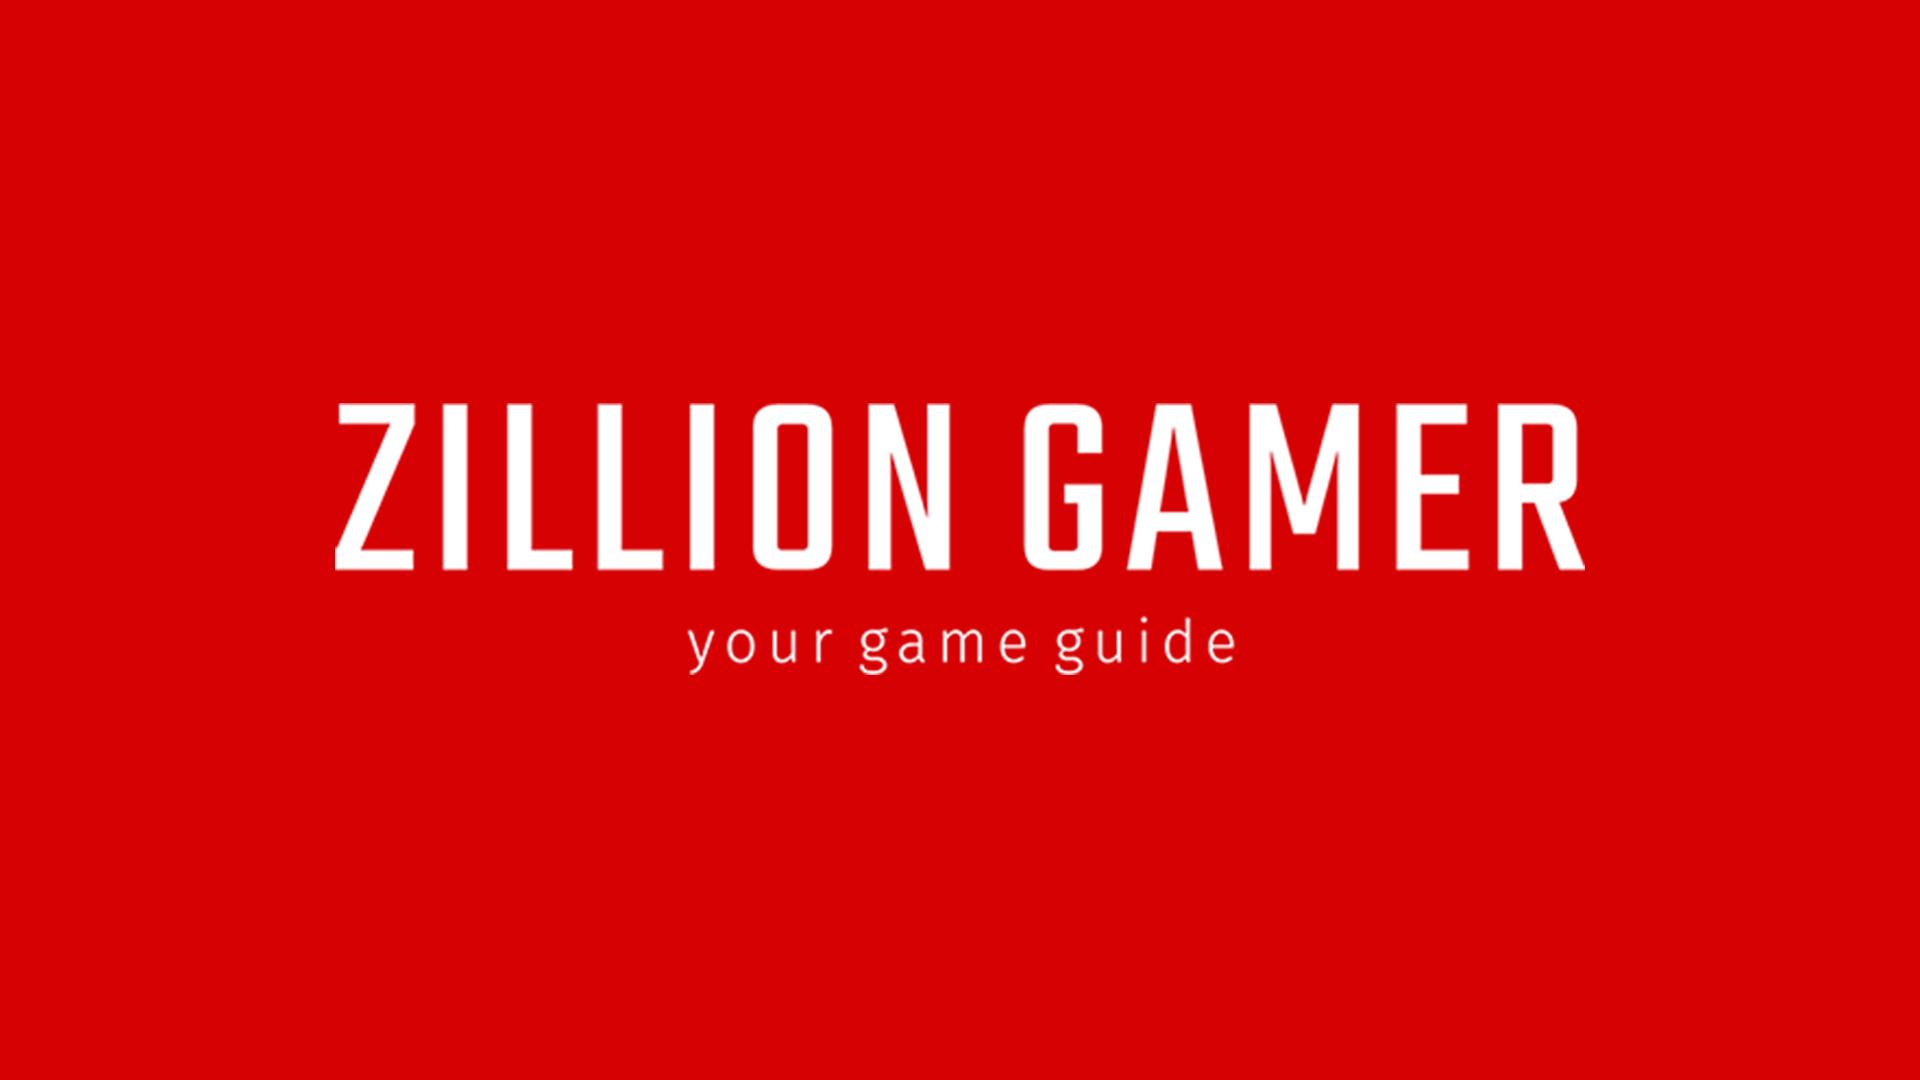 Zillion-Gamer-logo